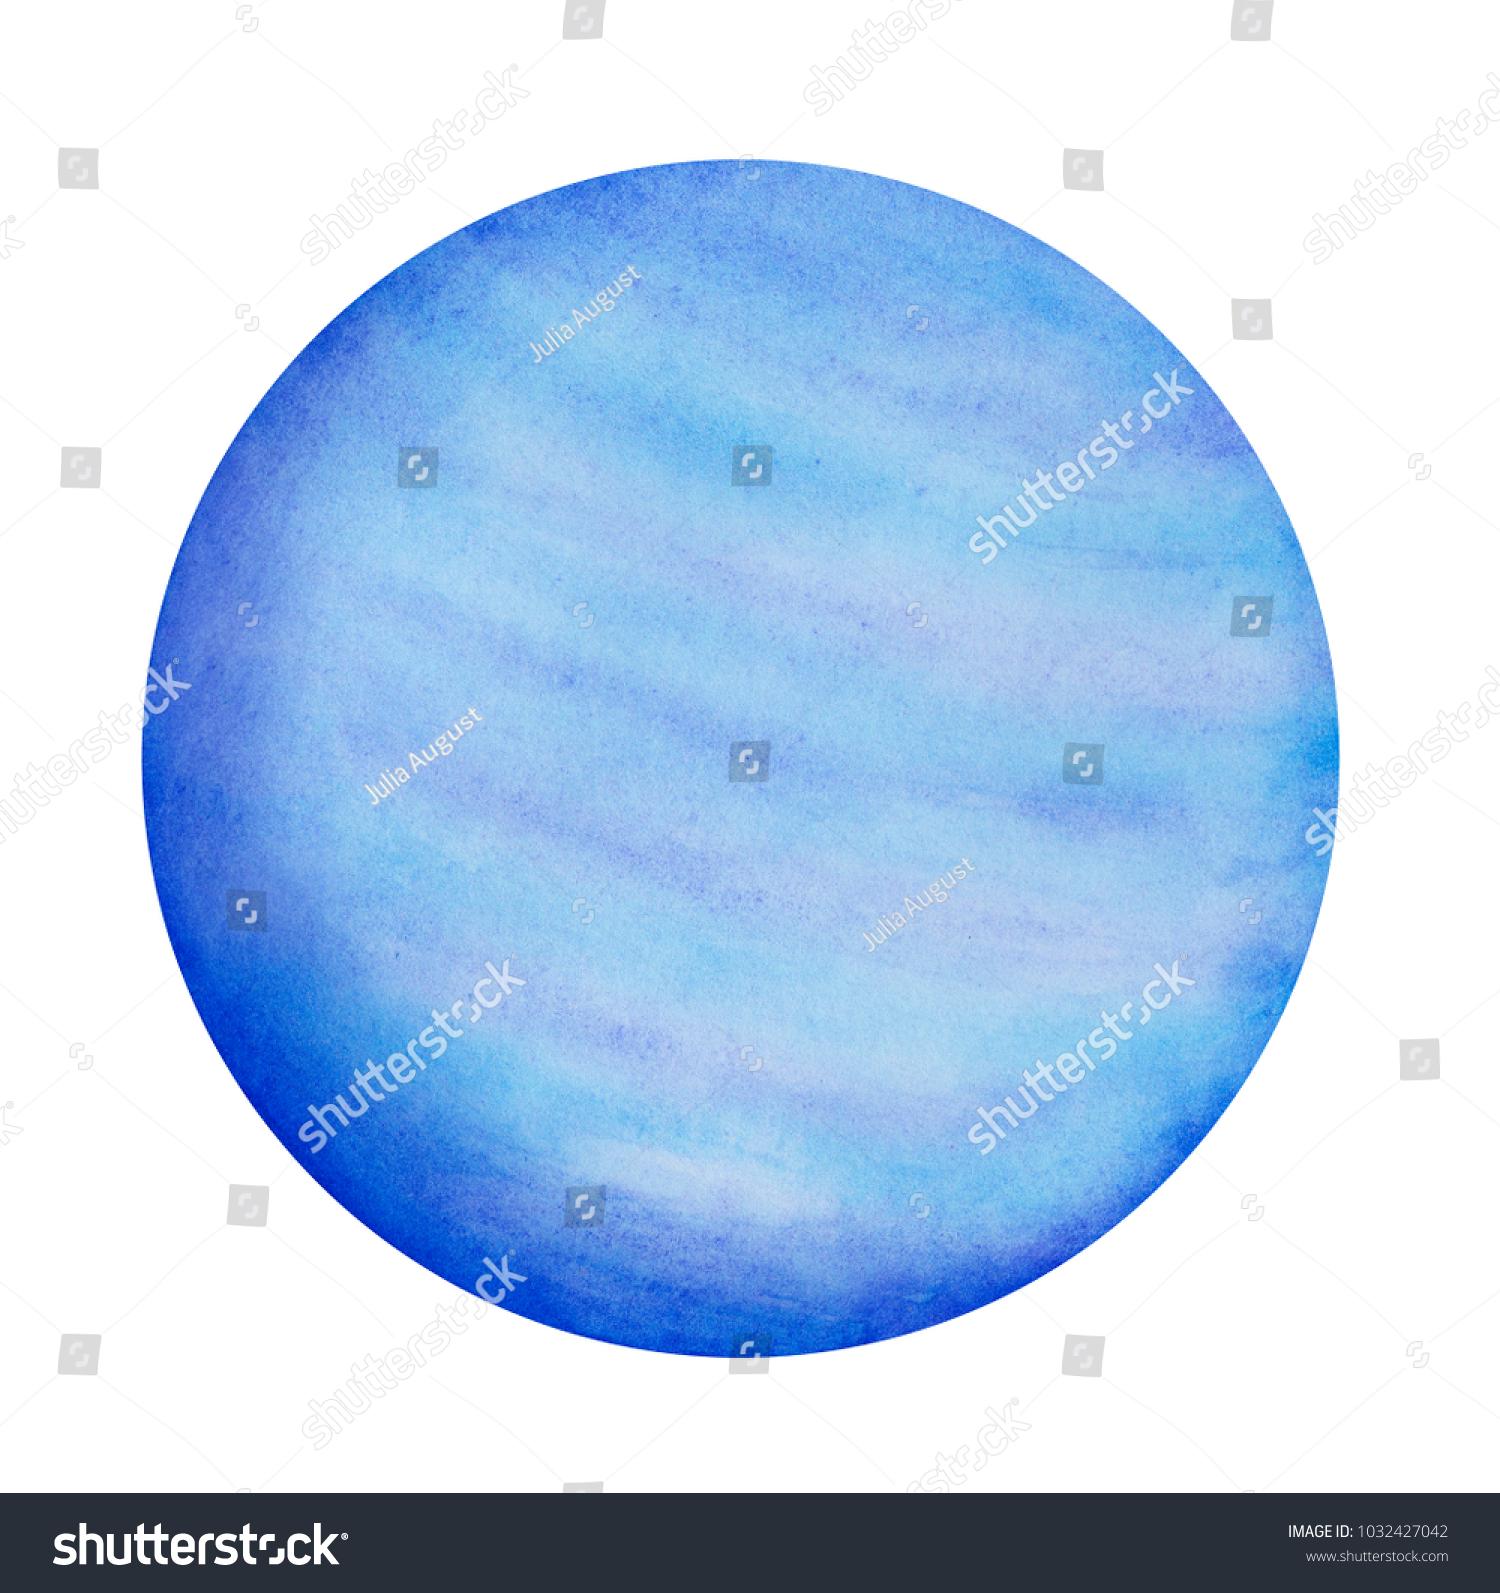 Neptune Planet Paint Symbol Dreams Subconscious Stock Illustration